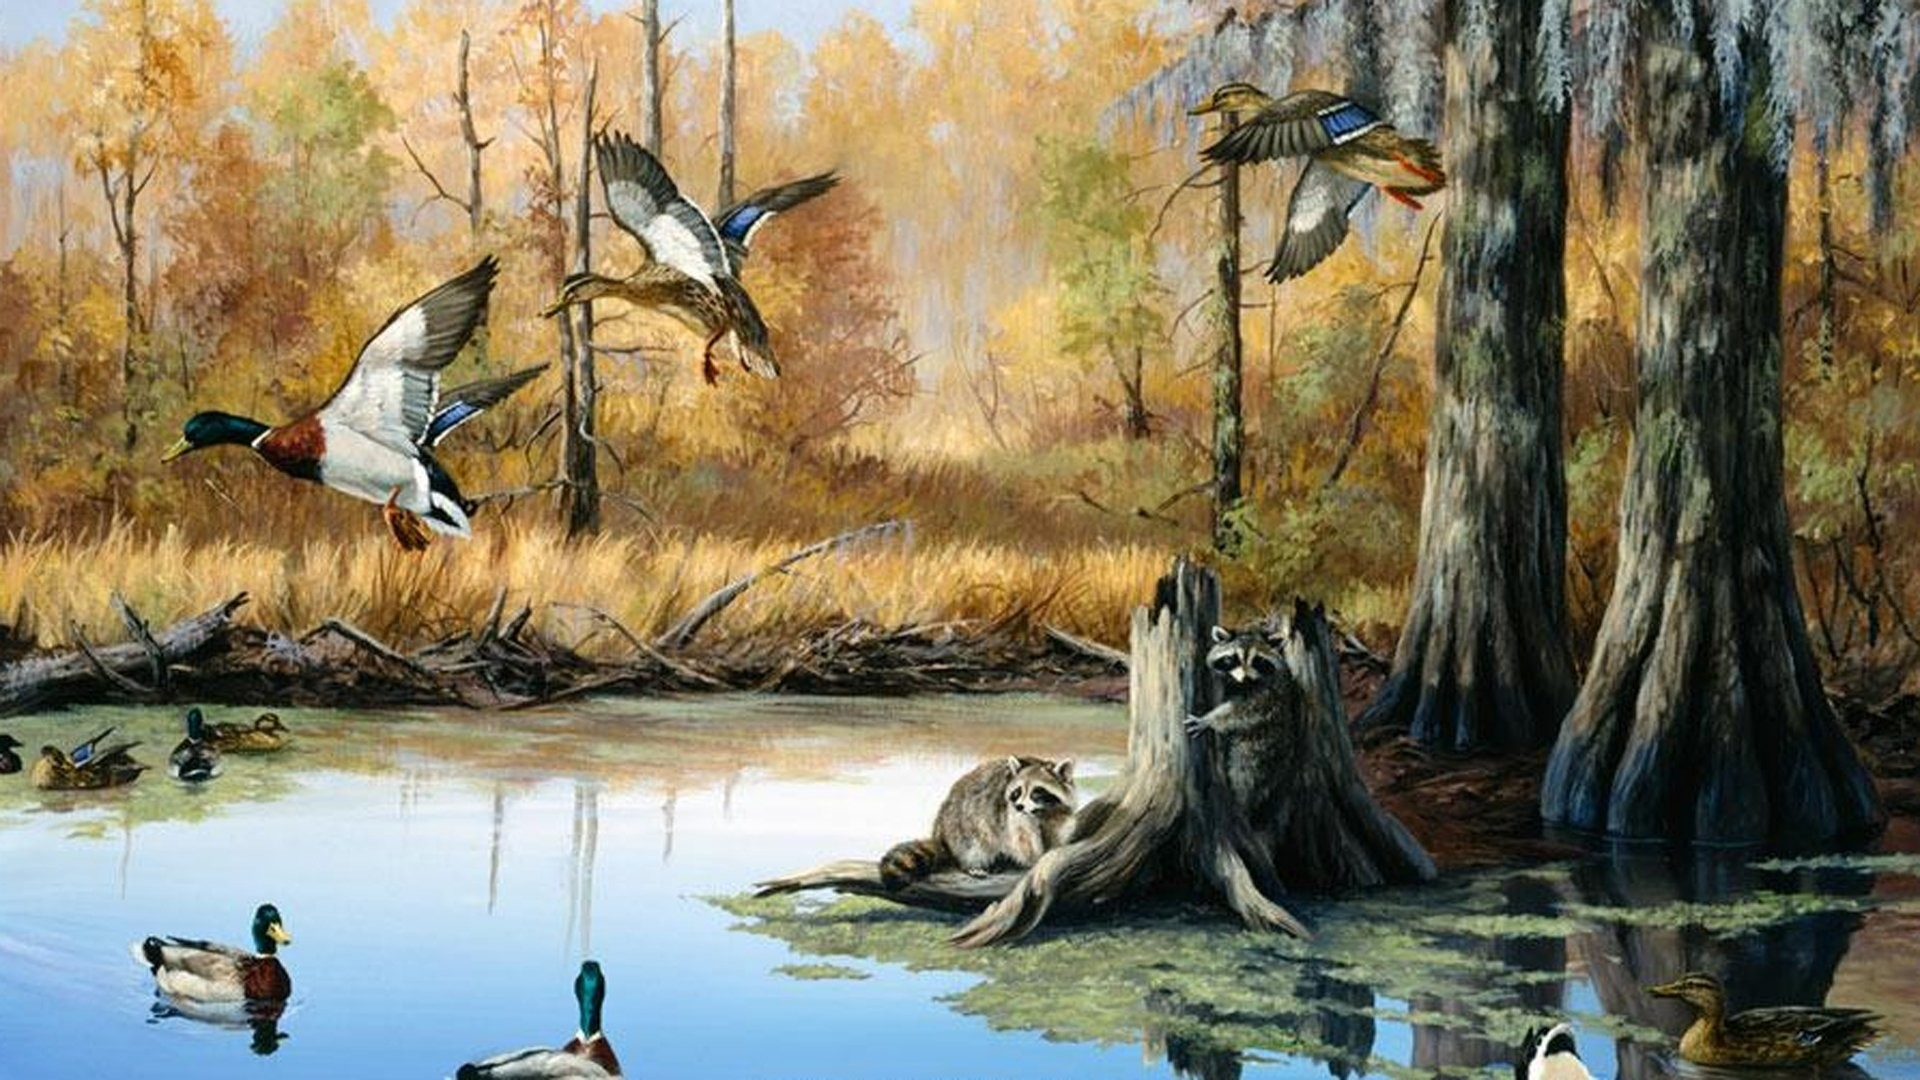 … duck hunting wallpaper iphone awswallpapershd com; bow …